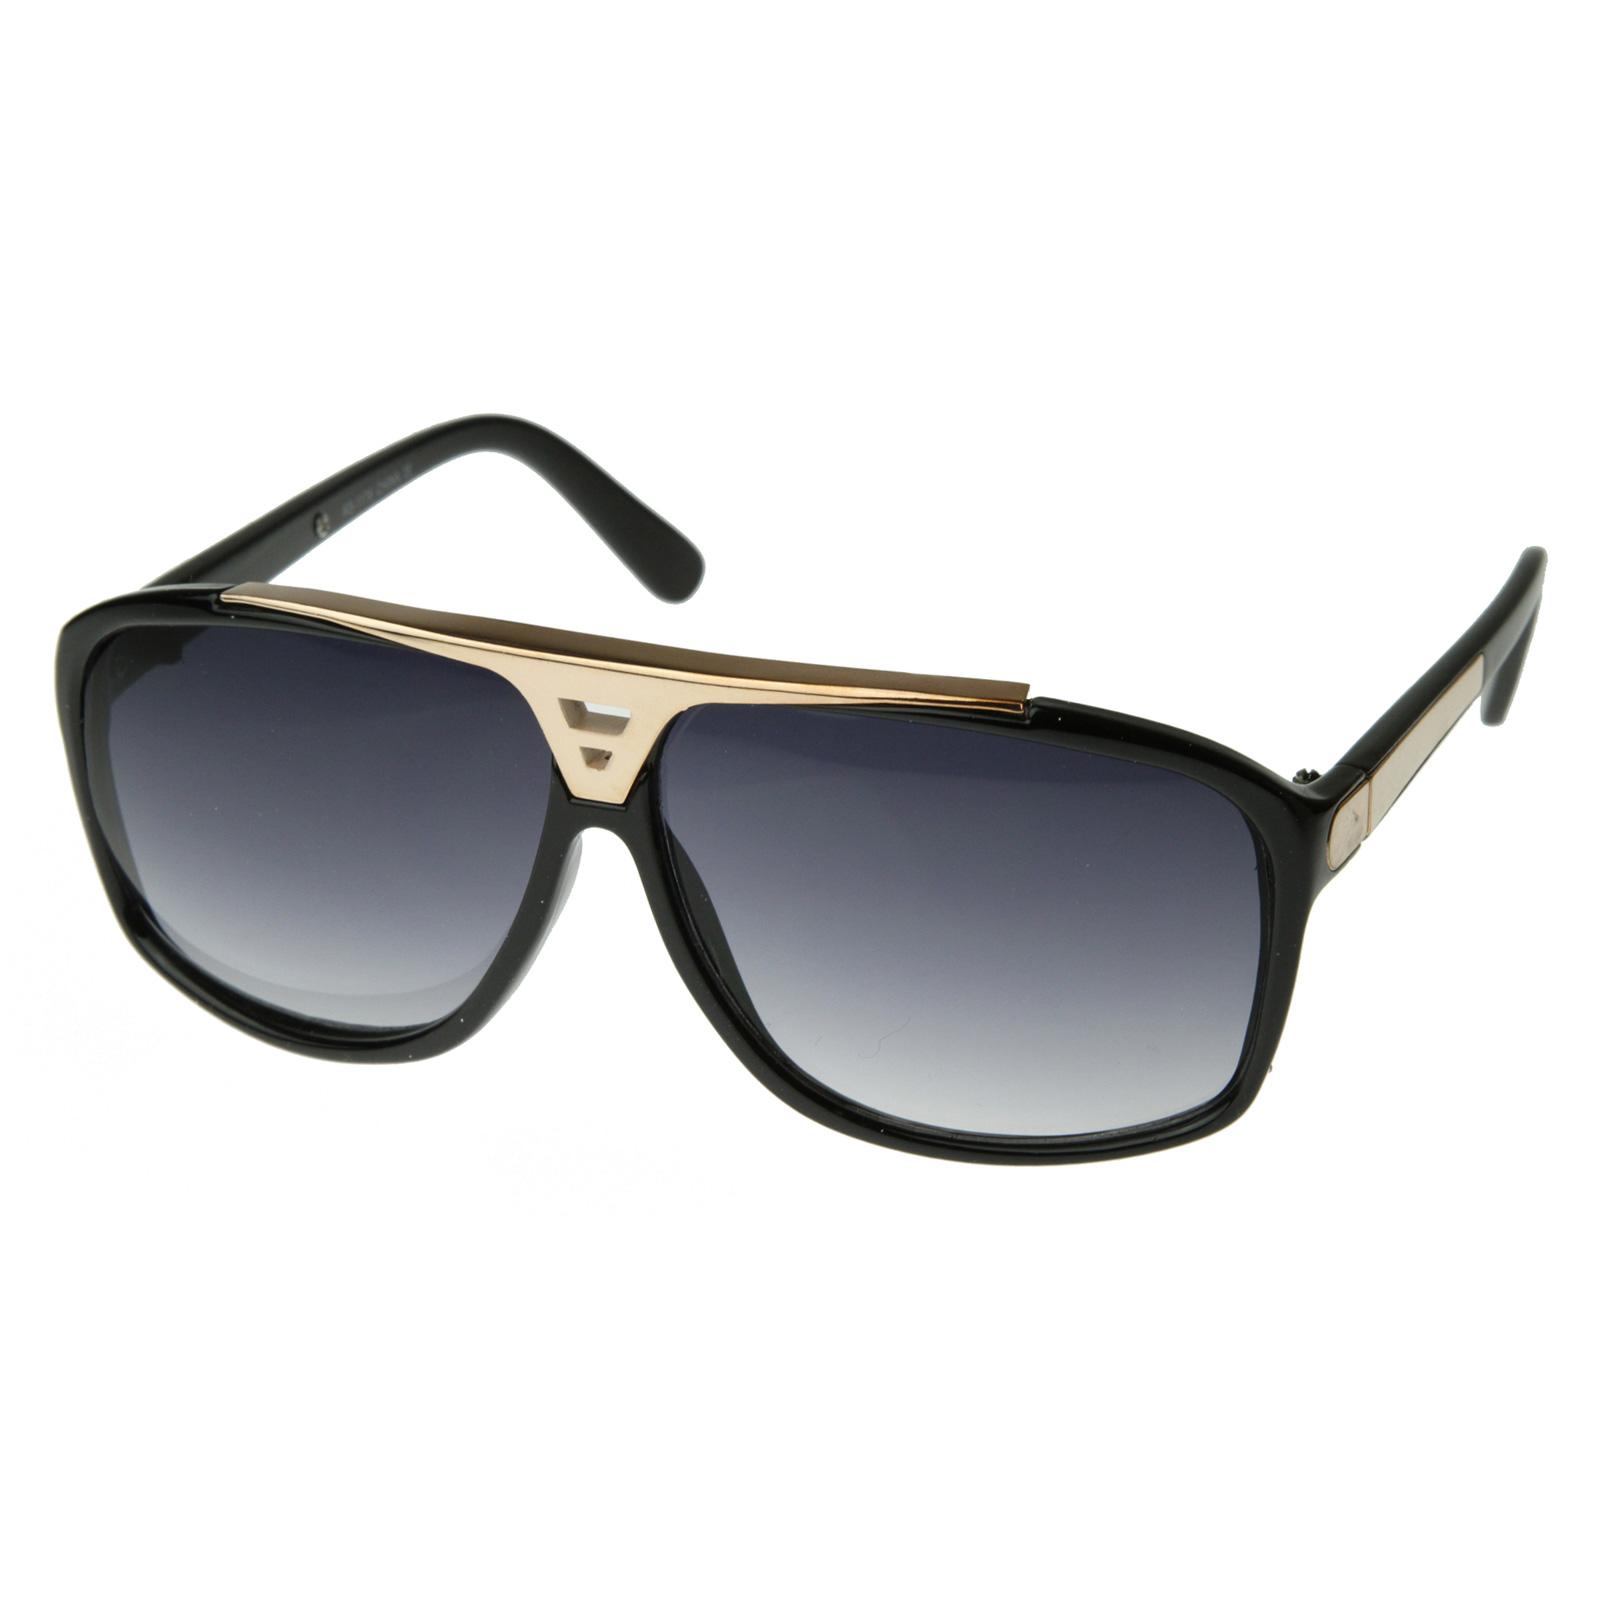 ... Designer Inspired High Fashion Square Flat Top Aviator Sunglasses 2903